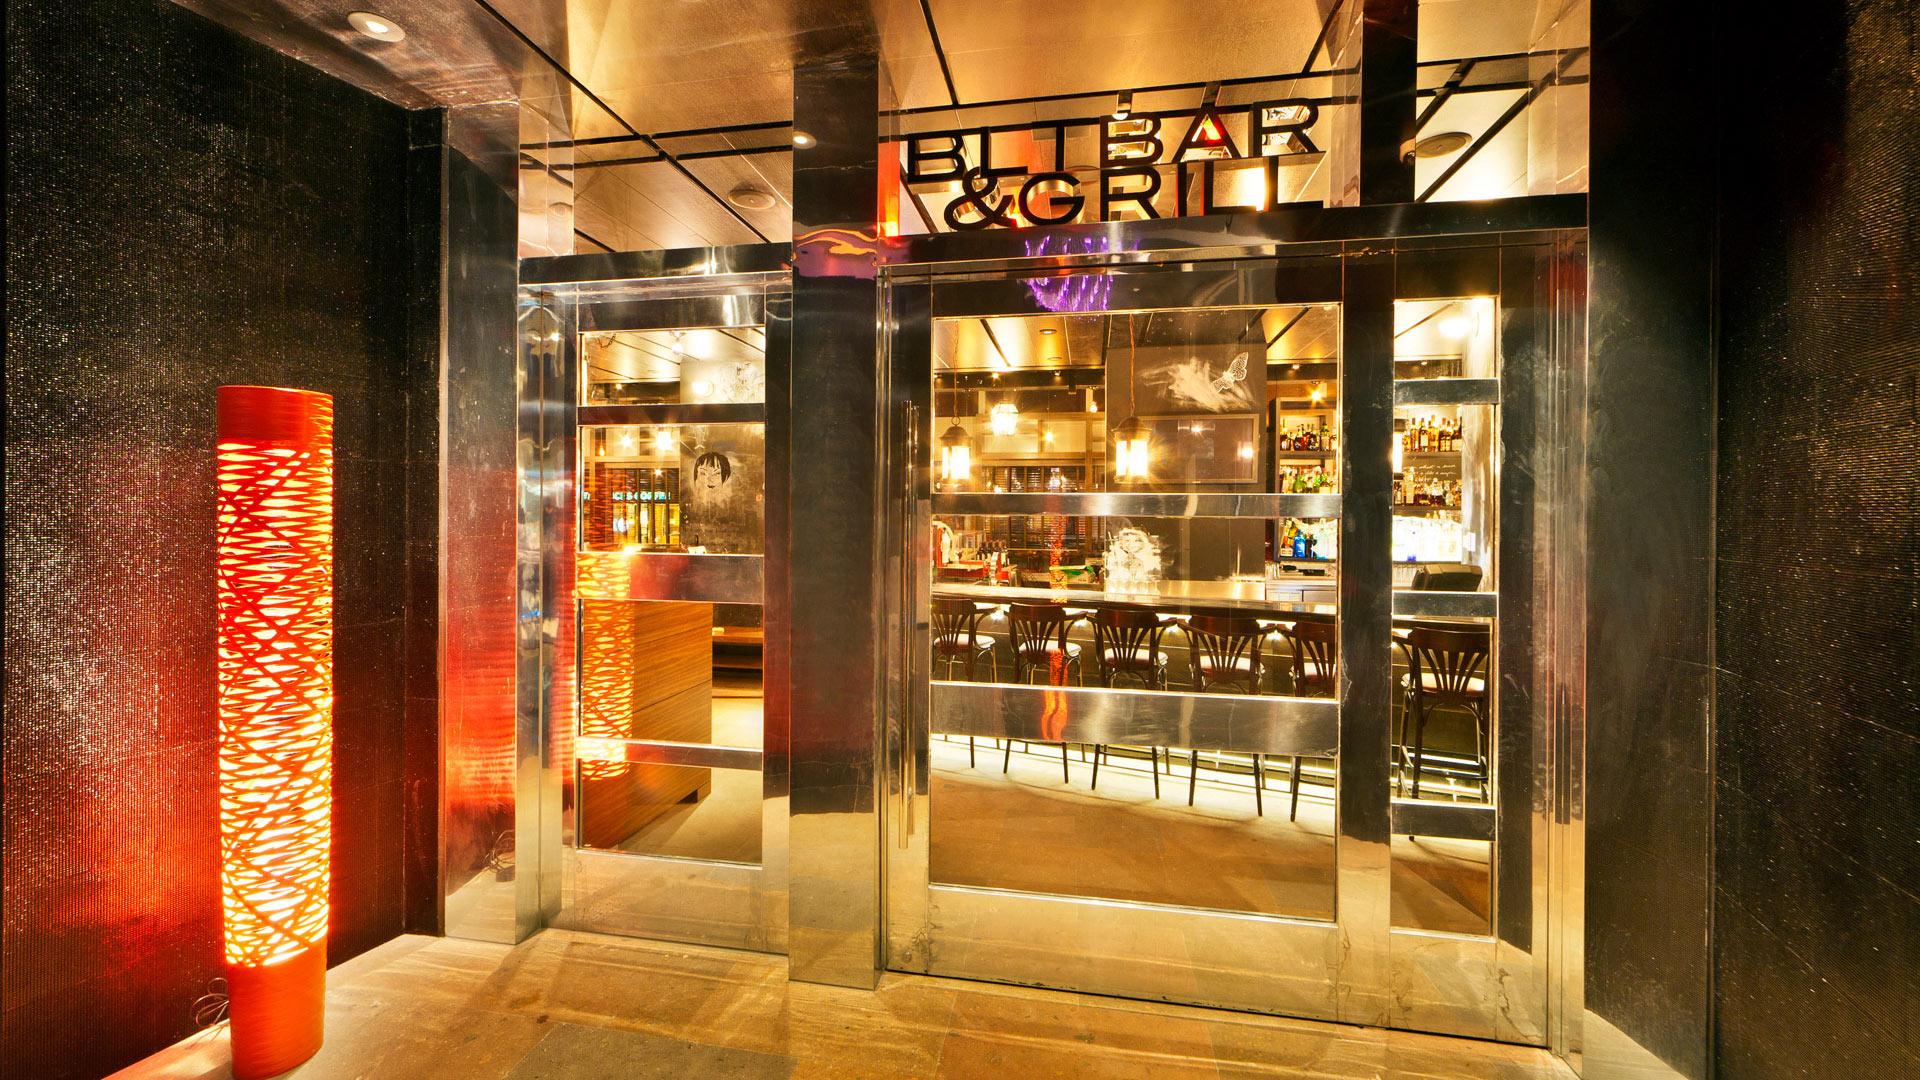 BLT Bar & Grill